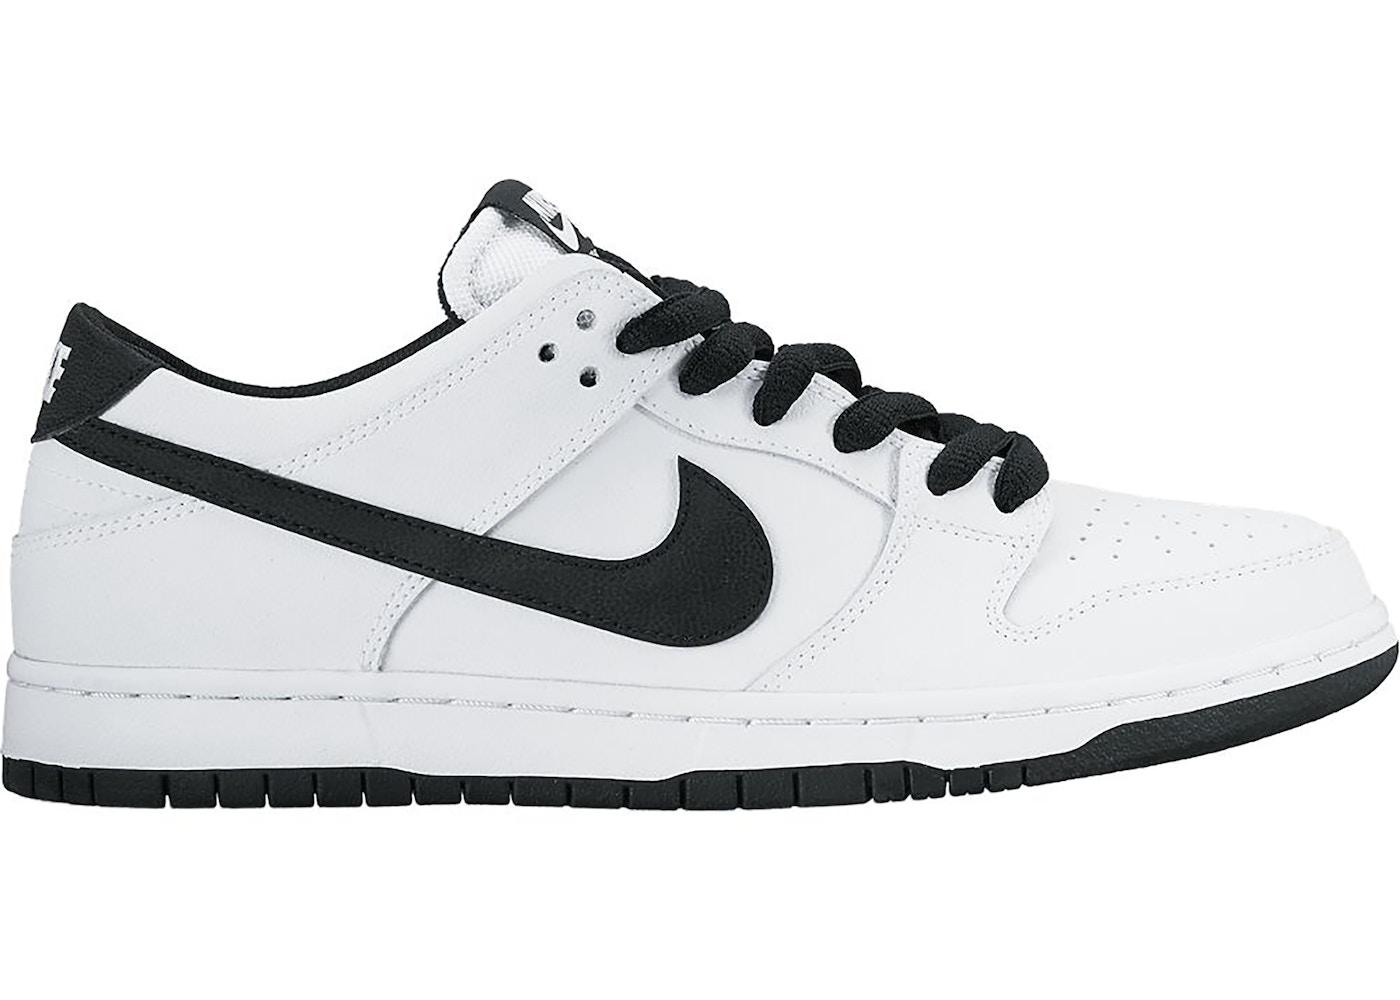 Nike SB Dunk Low IW White Black